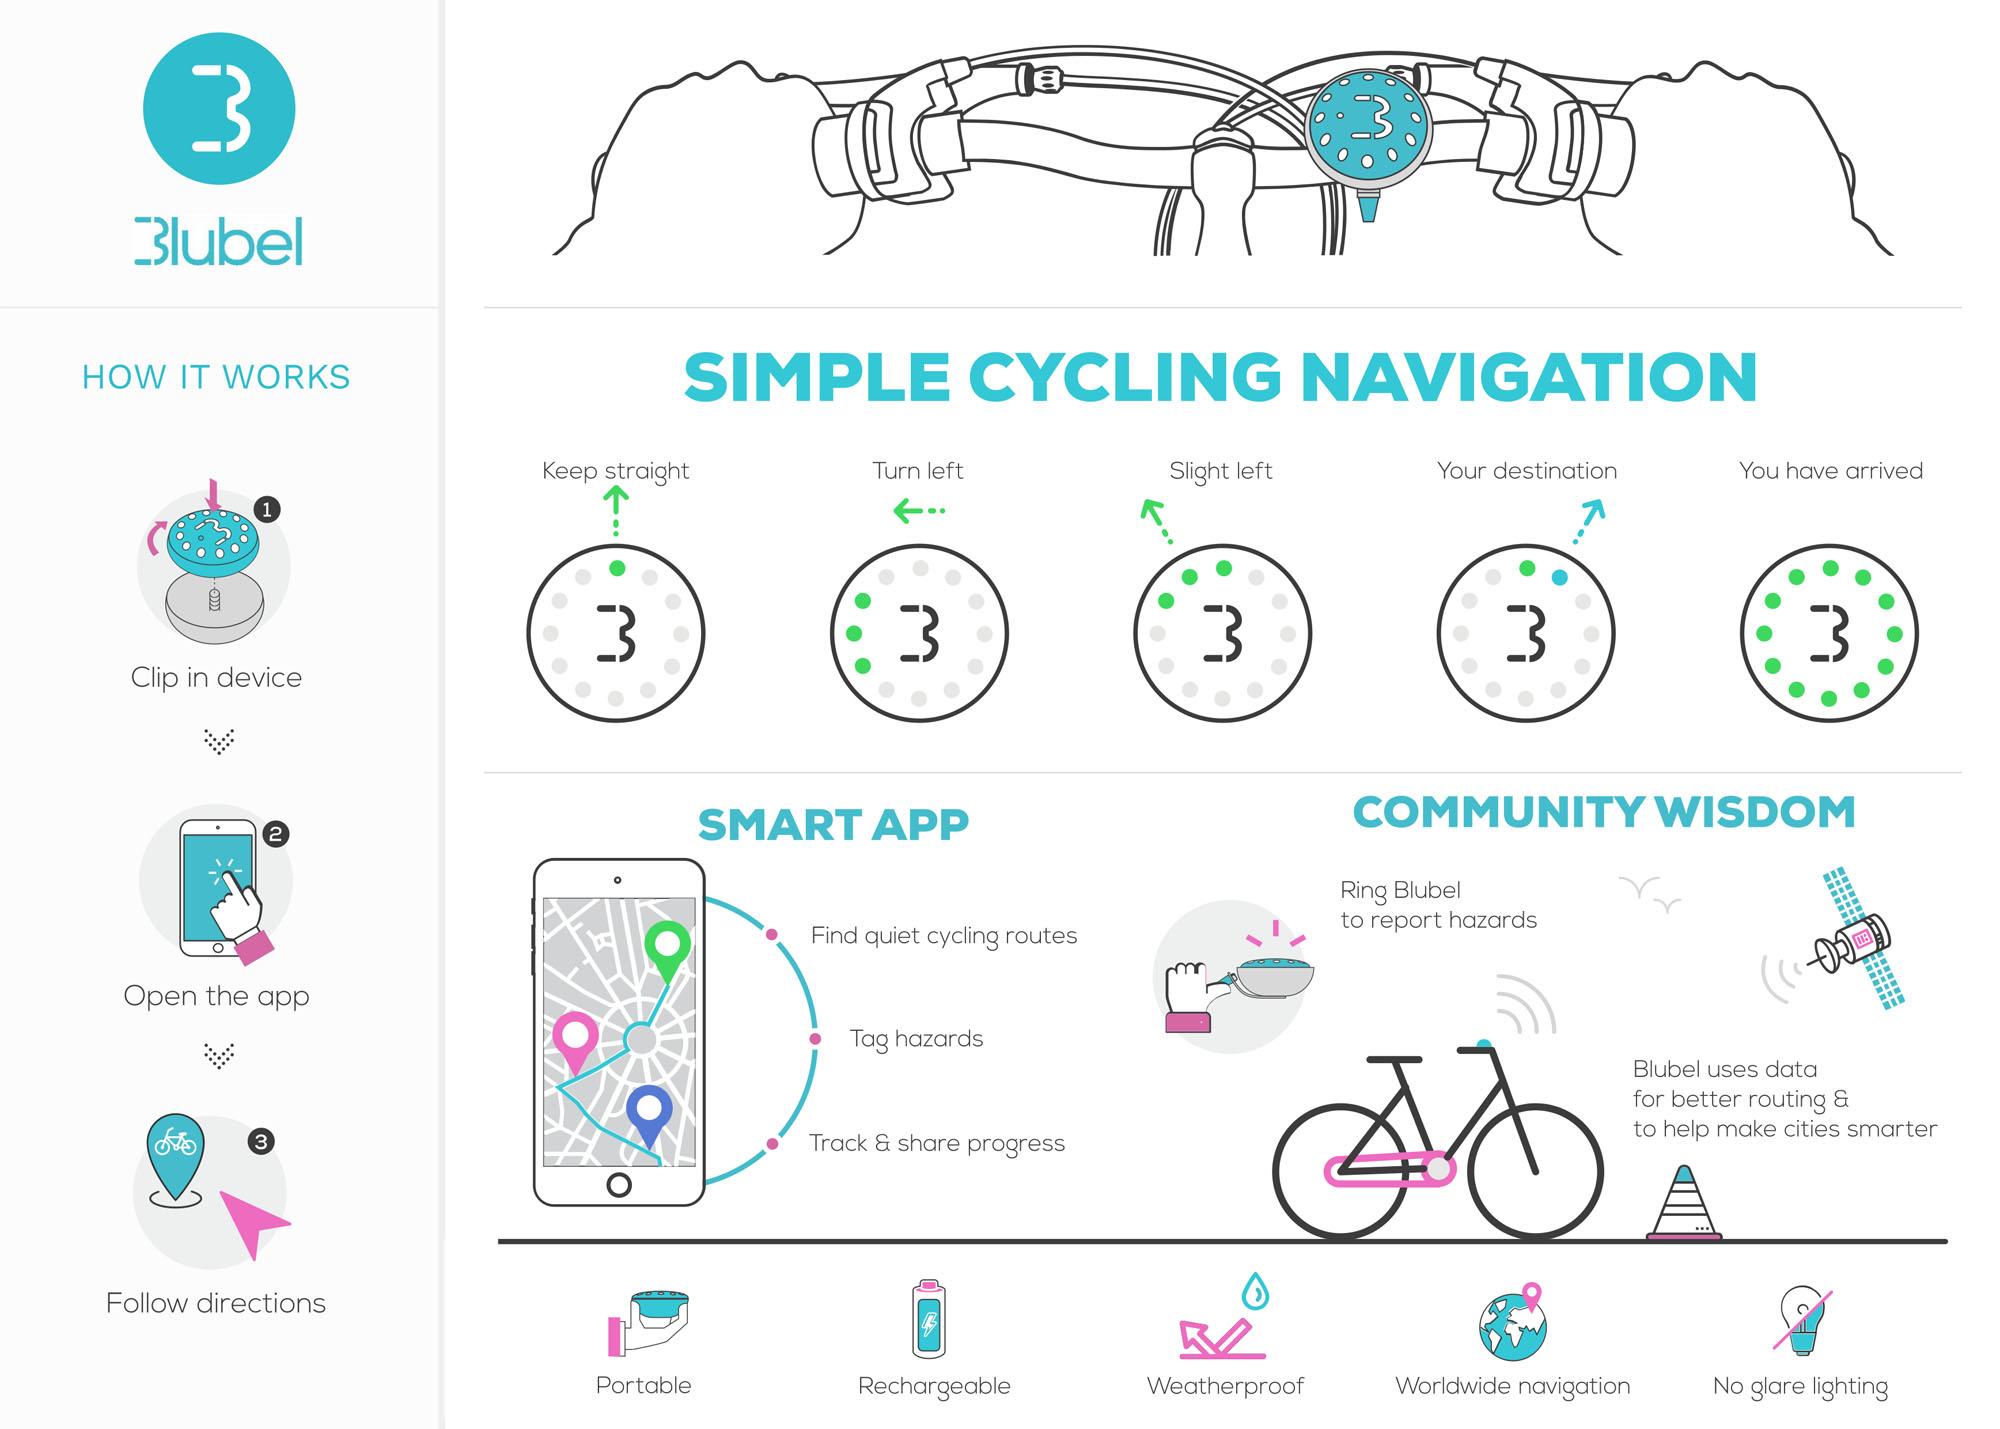 Blubel_timbre_navetador-04 Blubel: Un navegador inteligente para bicis